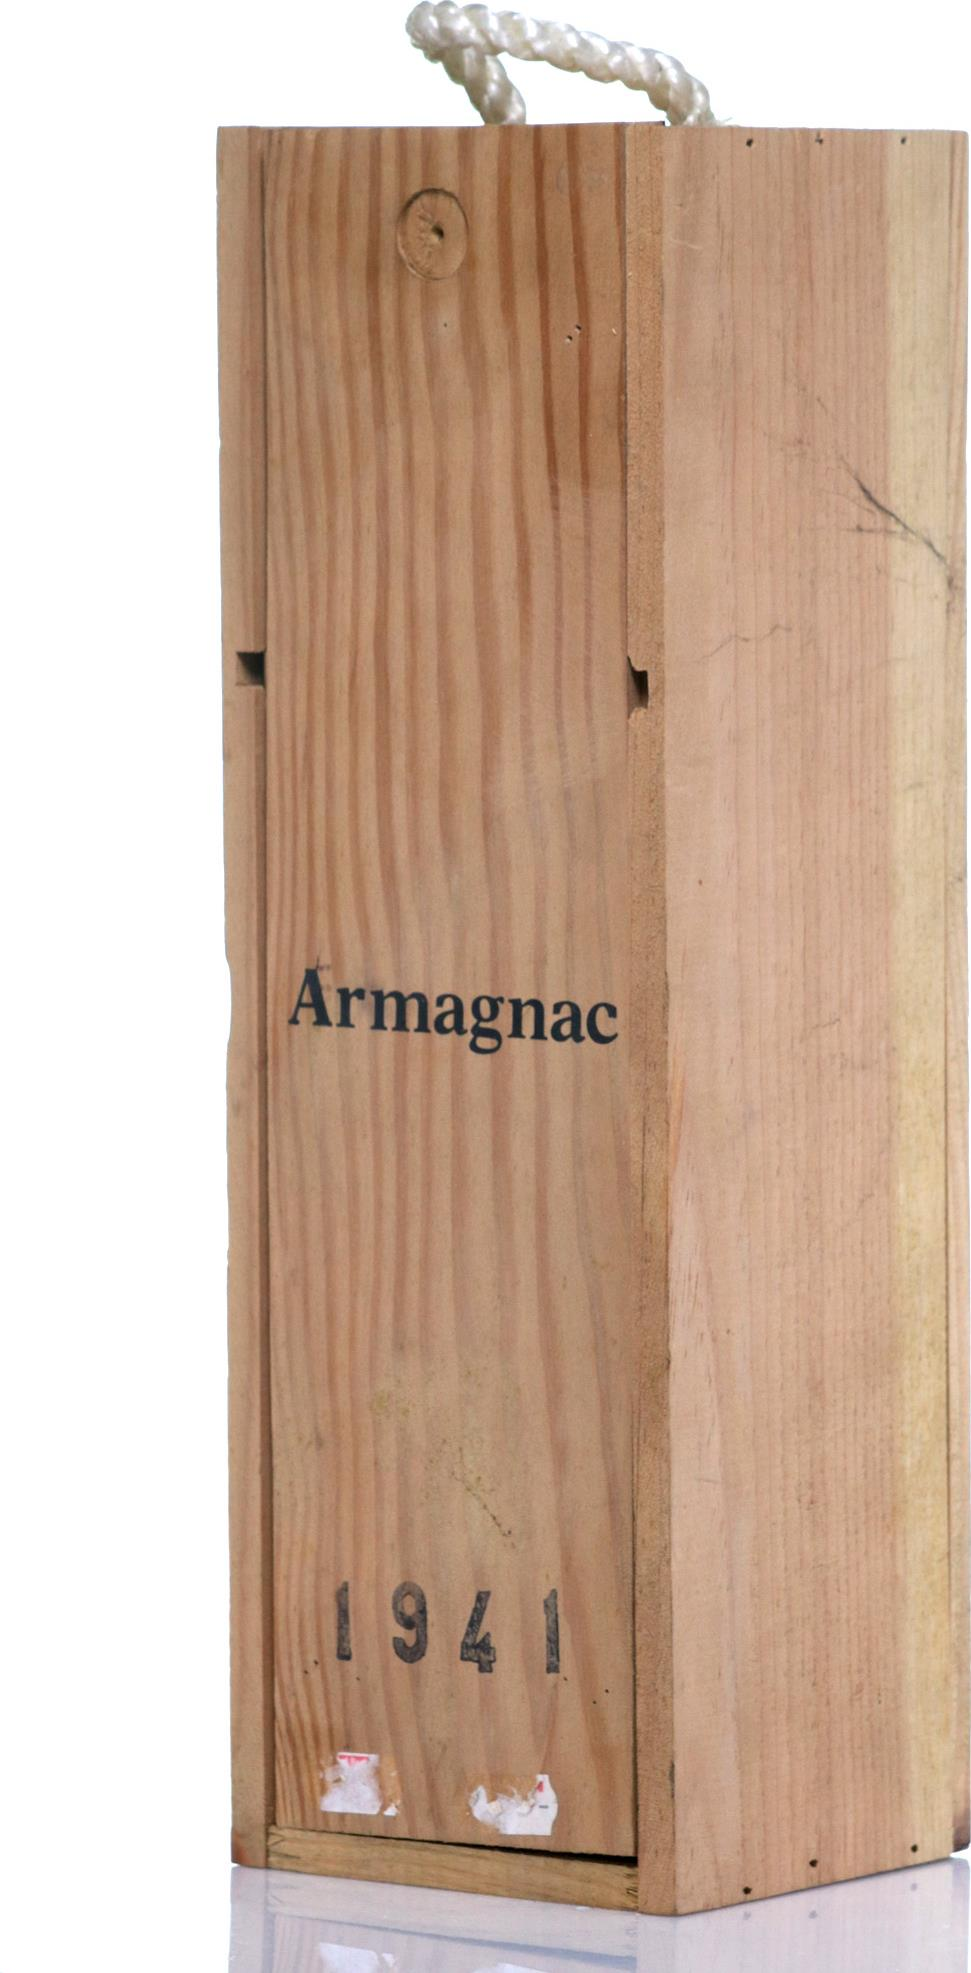 Armagnac 1941 Comte de Perac